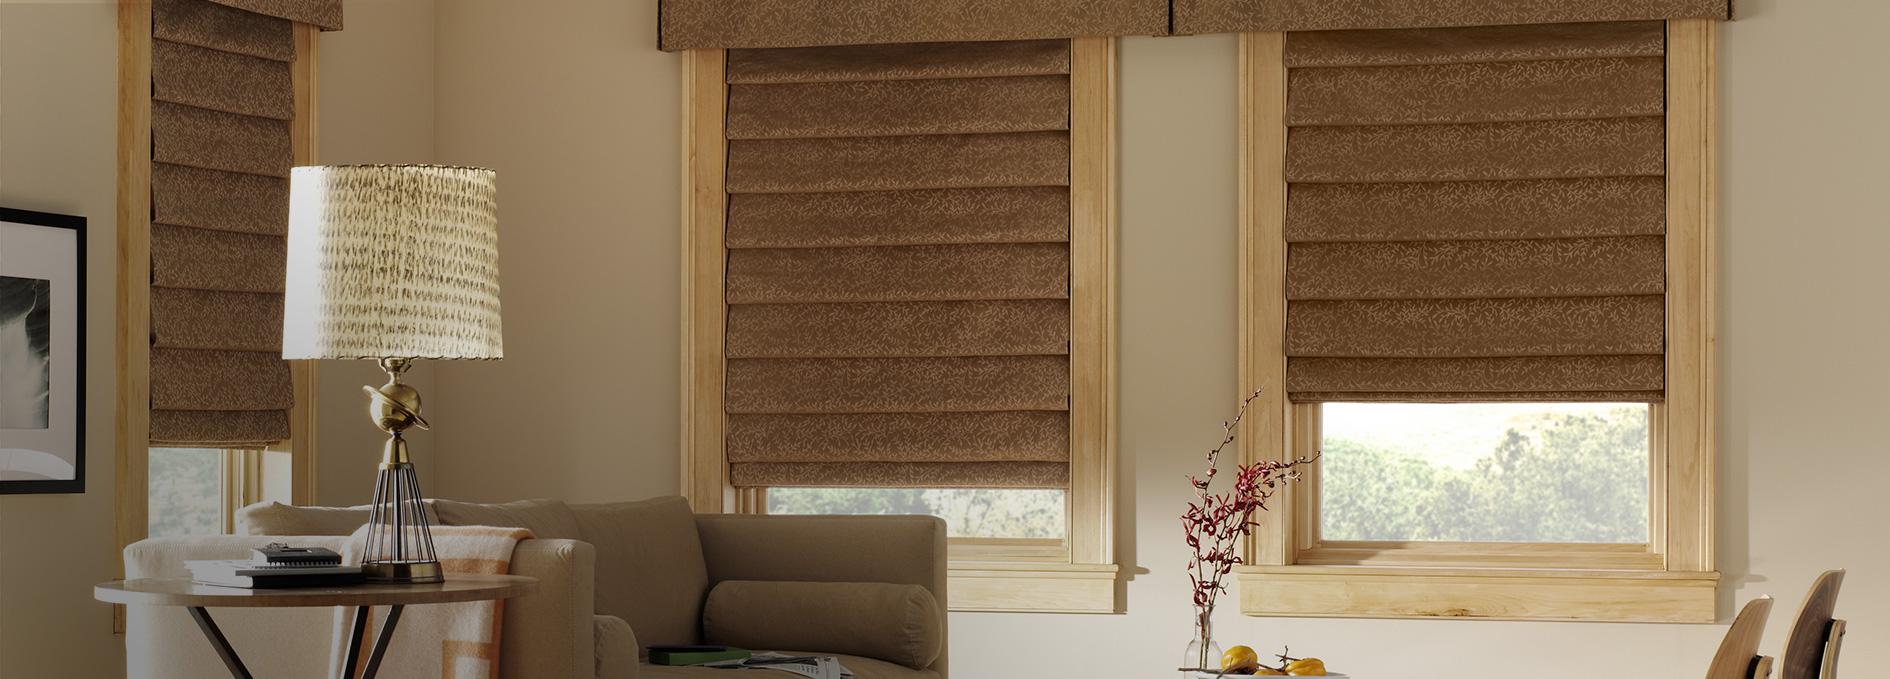 blinds horiz and spot tilted wd alta shutter blind